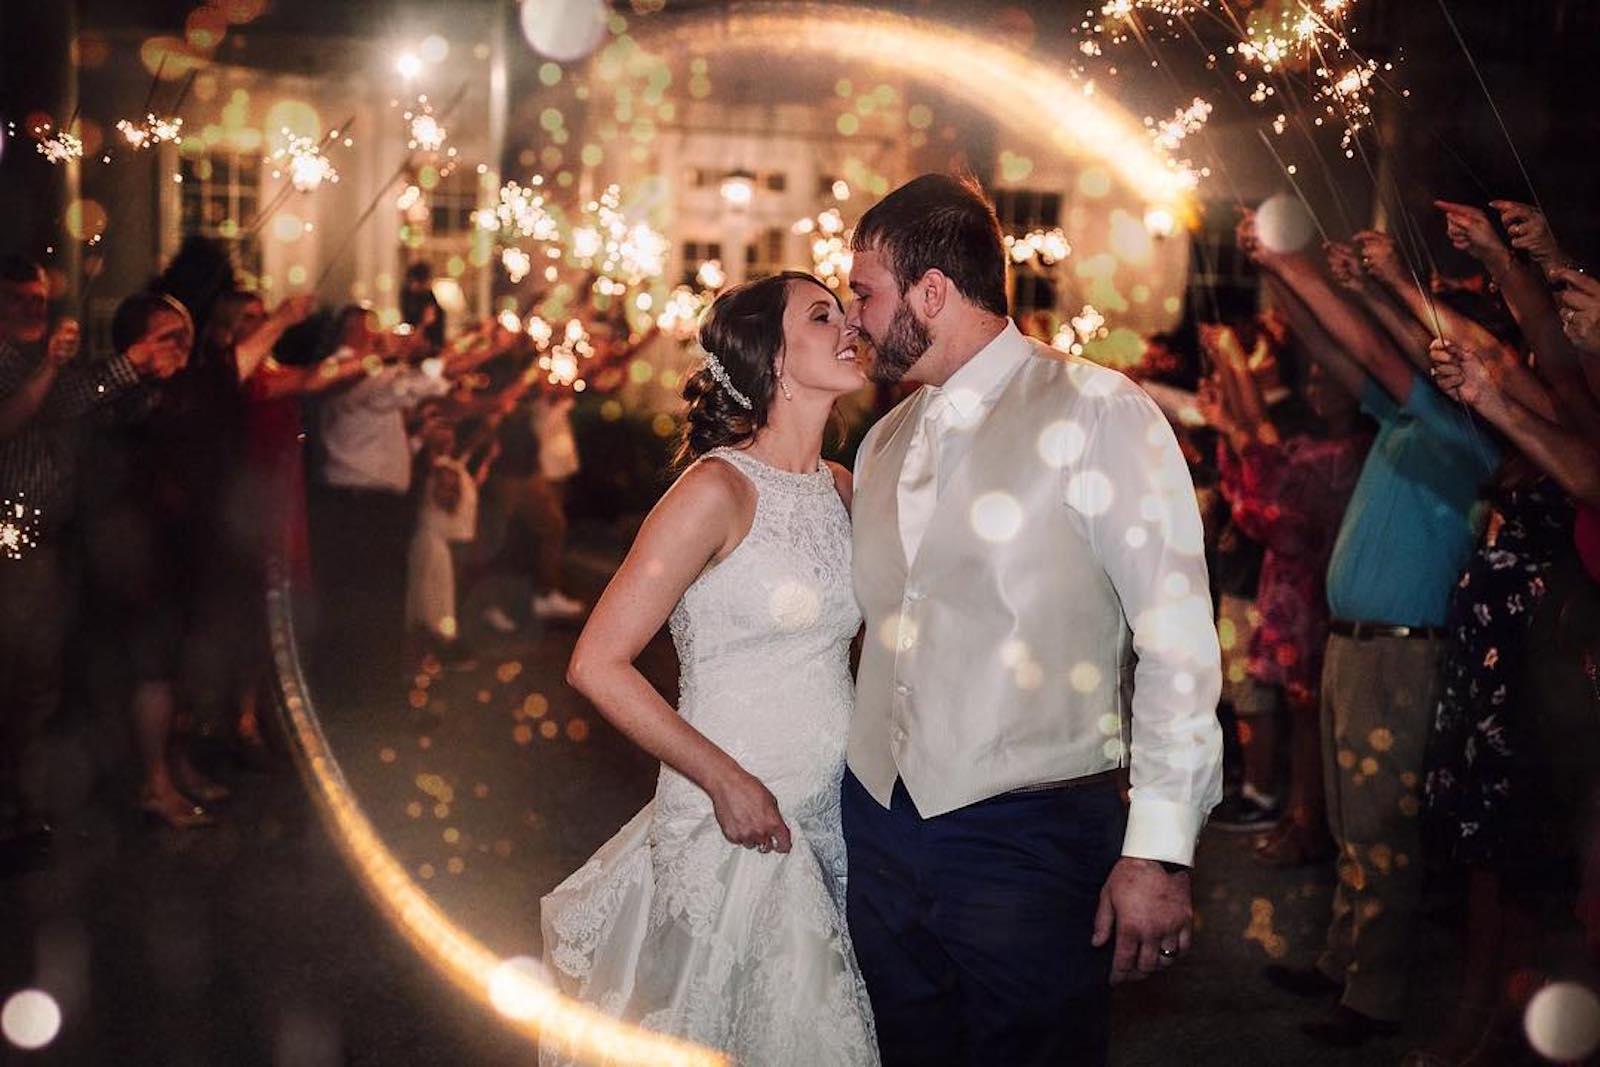 Wedding Exit Photo: Billie Shaye Style Nashville Wedding Discount